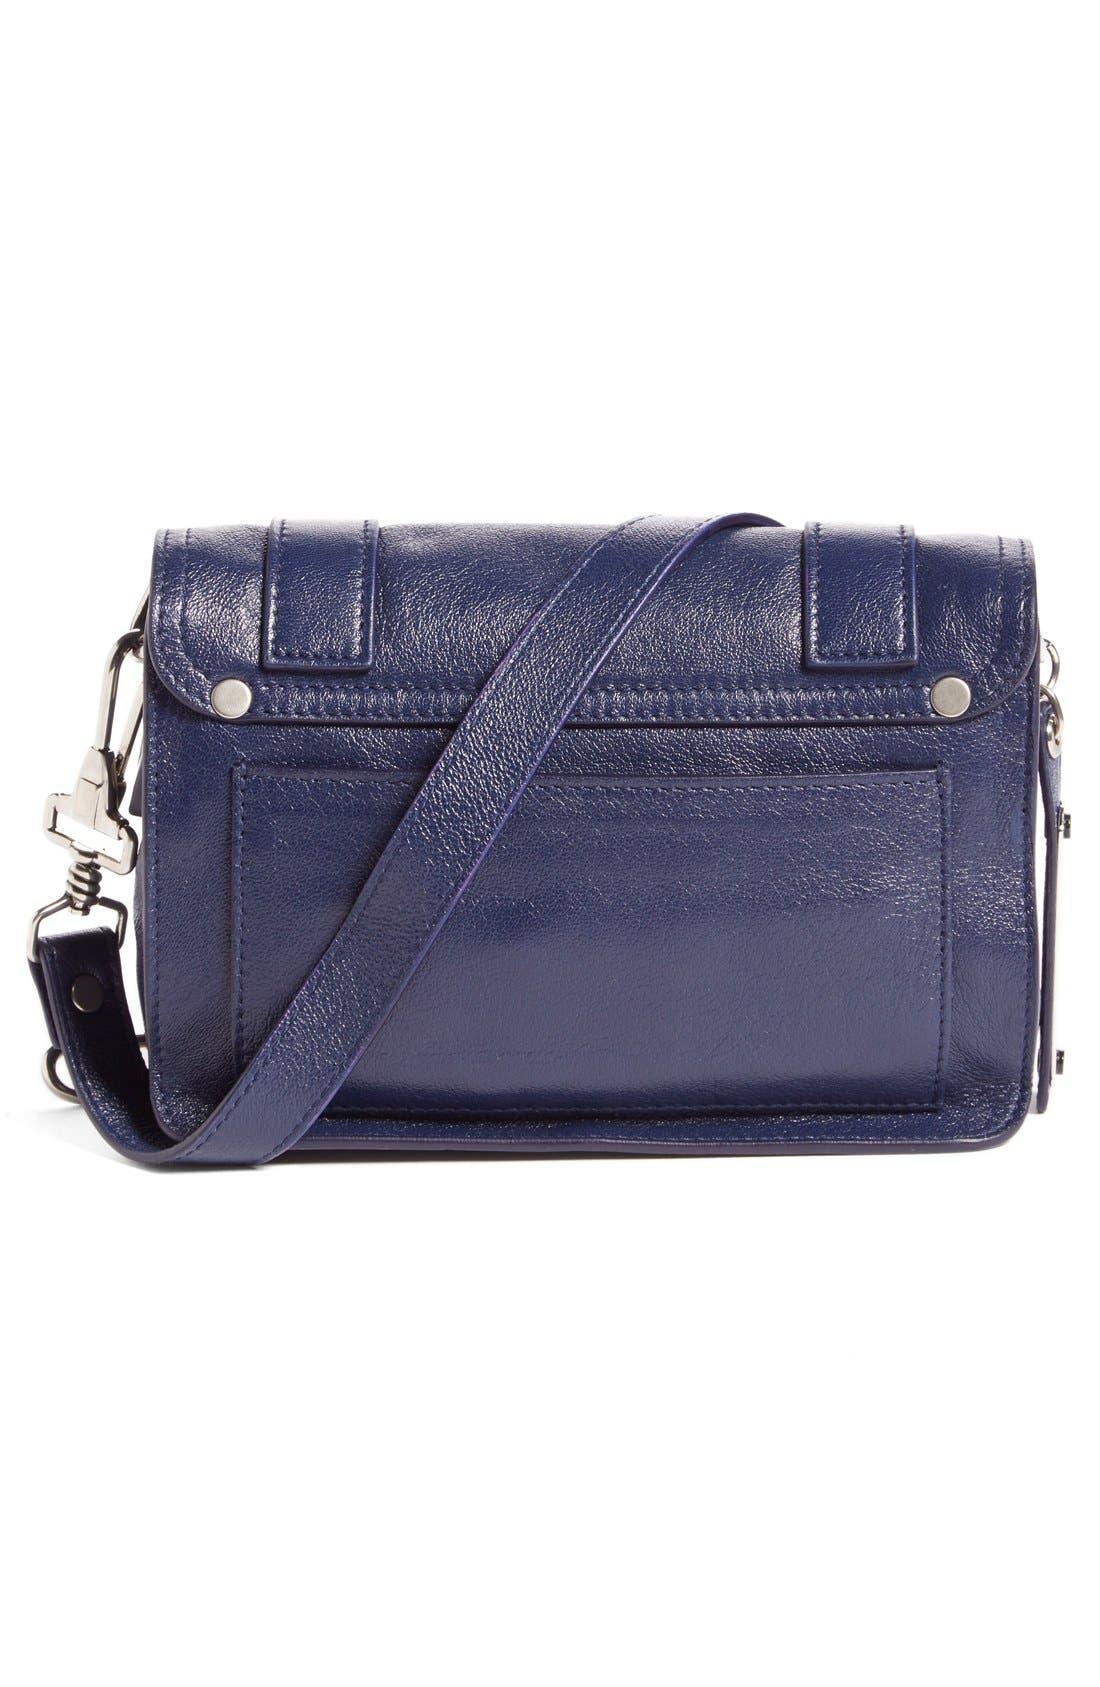 Alternate Image 3  - Proenza Schouler 'Mini PS1' Lambskin Leather Crossbody Bag